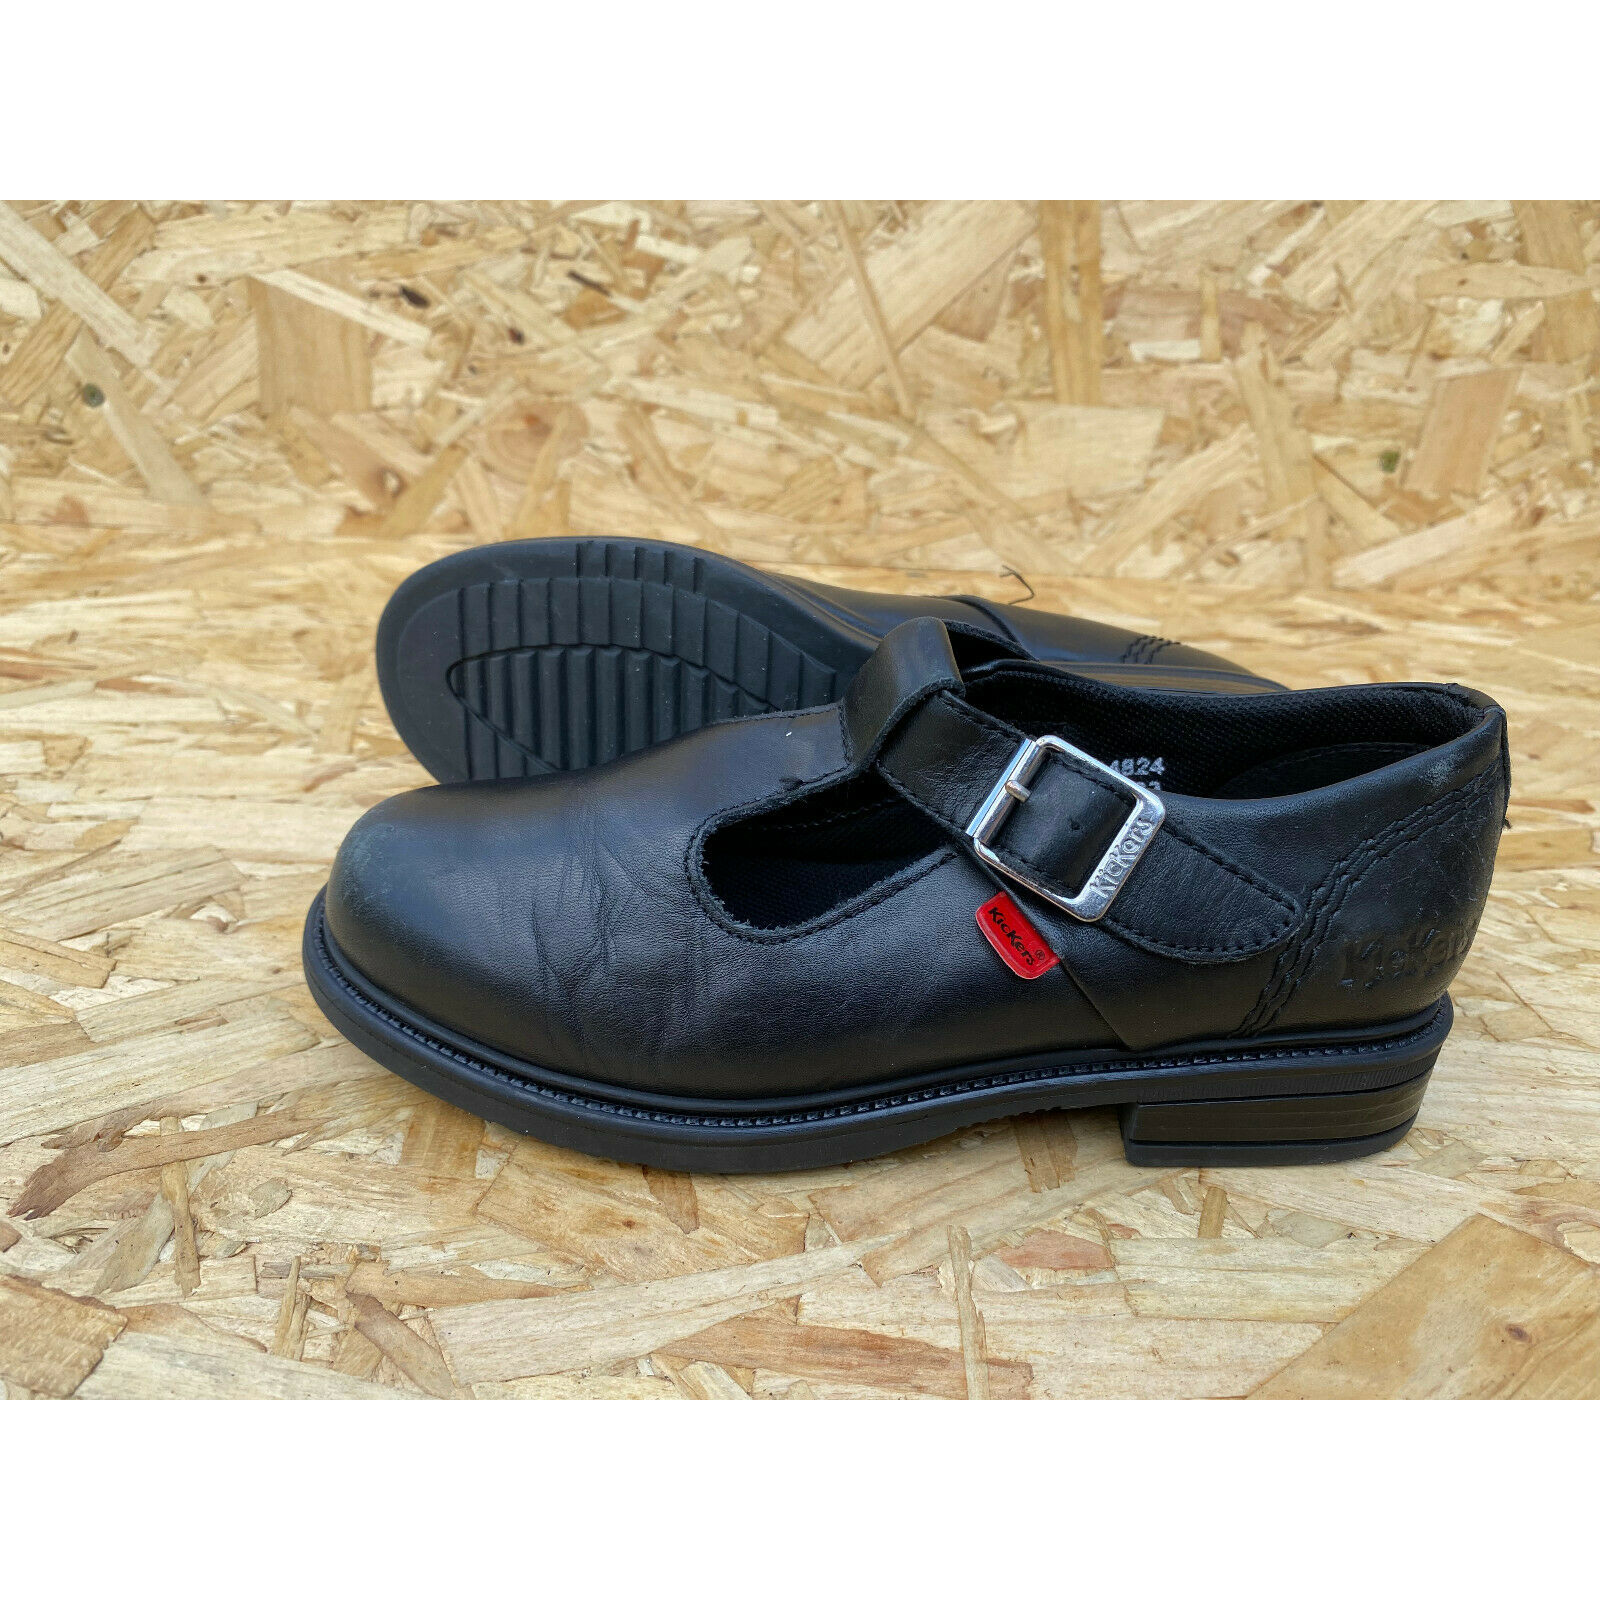 Kickers Lach T Bar Girls Black Leather Shoes UK 1 EU 33 RRP